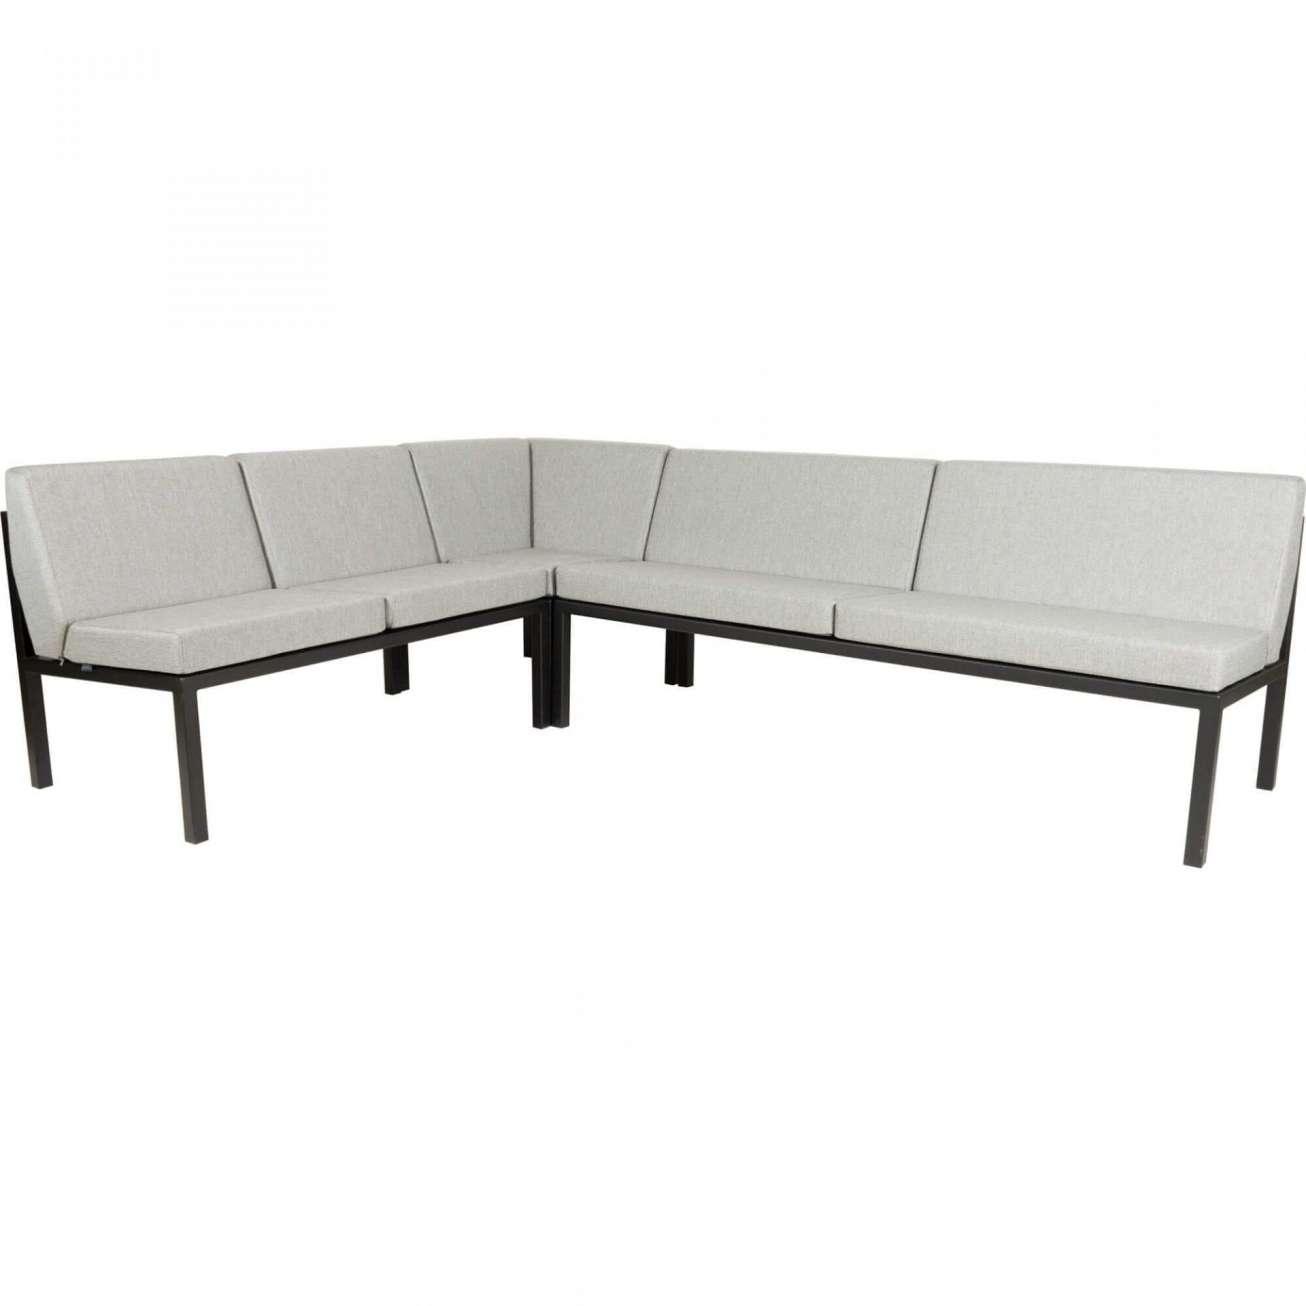 Sundays Frame Multi sofa hjørnegruppe i sort aluminium med lysgrå puter